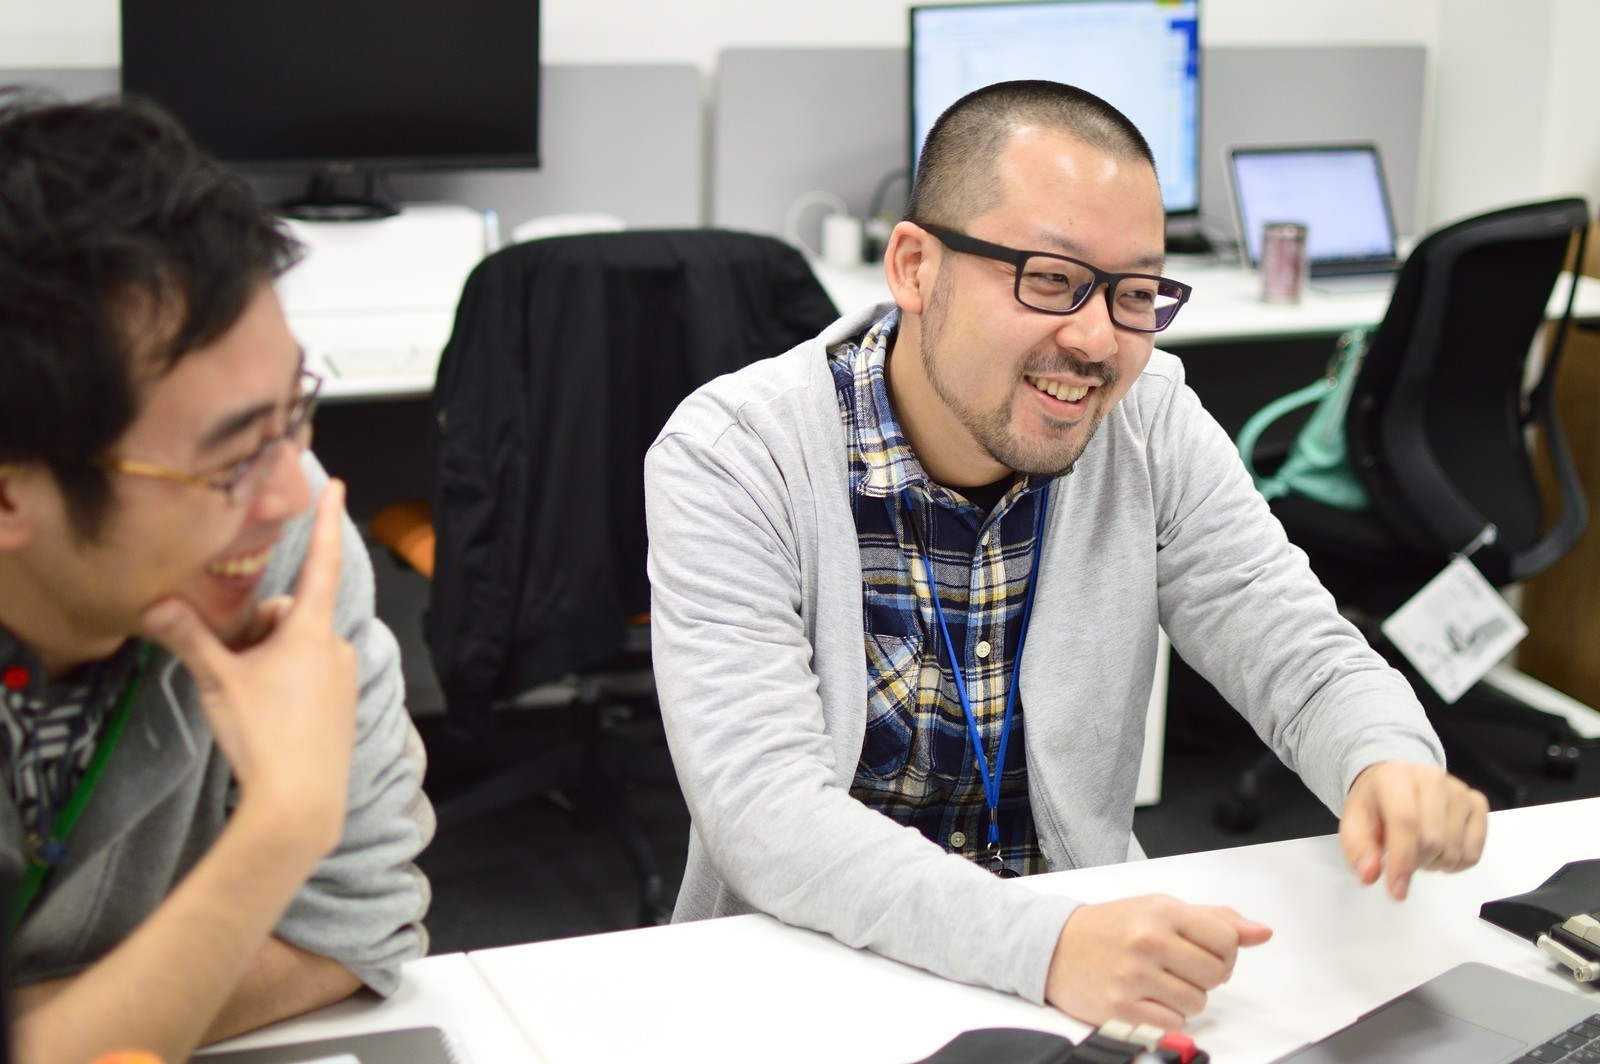 【React/Redux利用】「働き方改革」を推進する次期サービスのスタートアップメンバー募集!<多国籍なエンジニアが在籍◎>